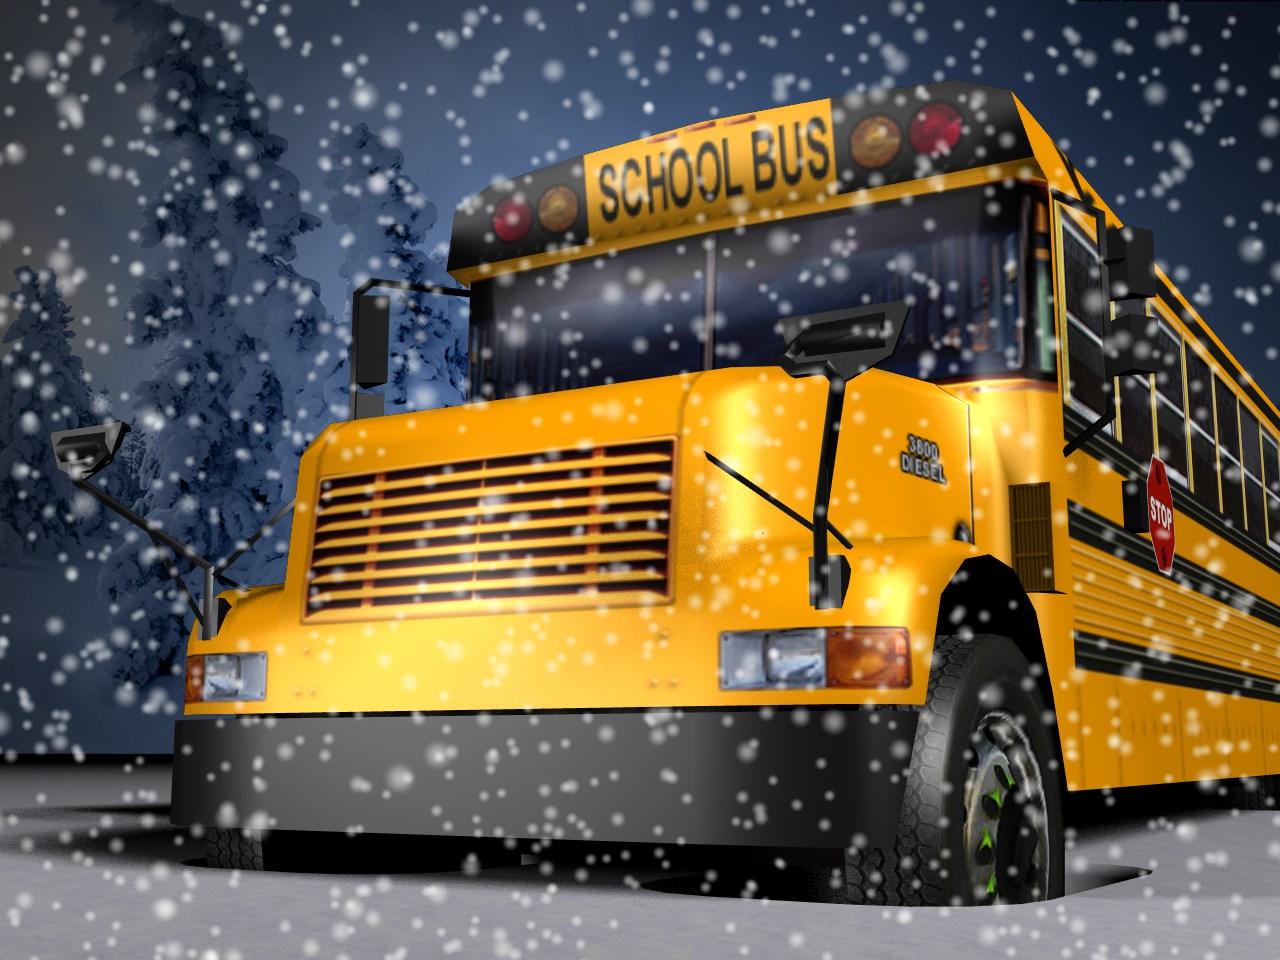 2-6 snow over school bus_1549457990227.jpg.jpg